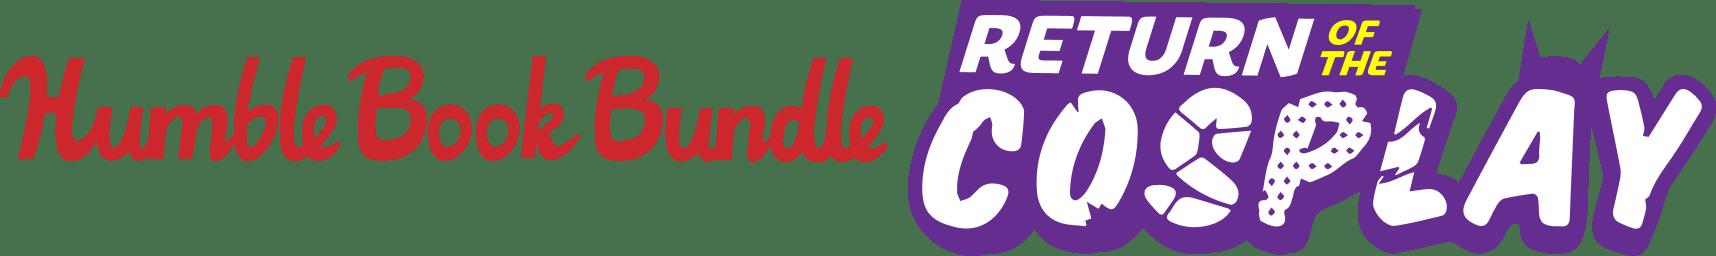 Humble Book Bundle: Return of the Cosplay